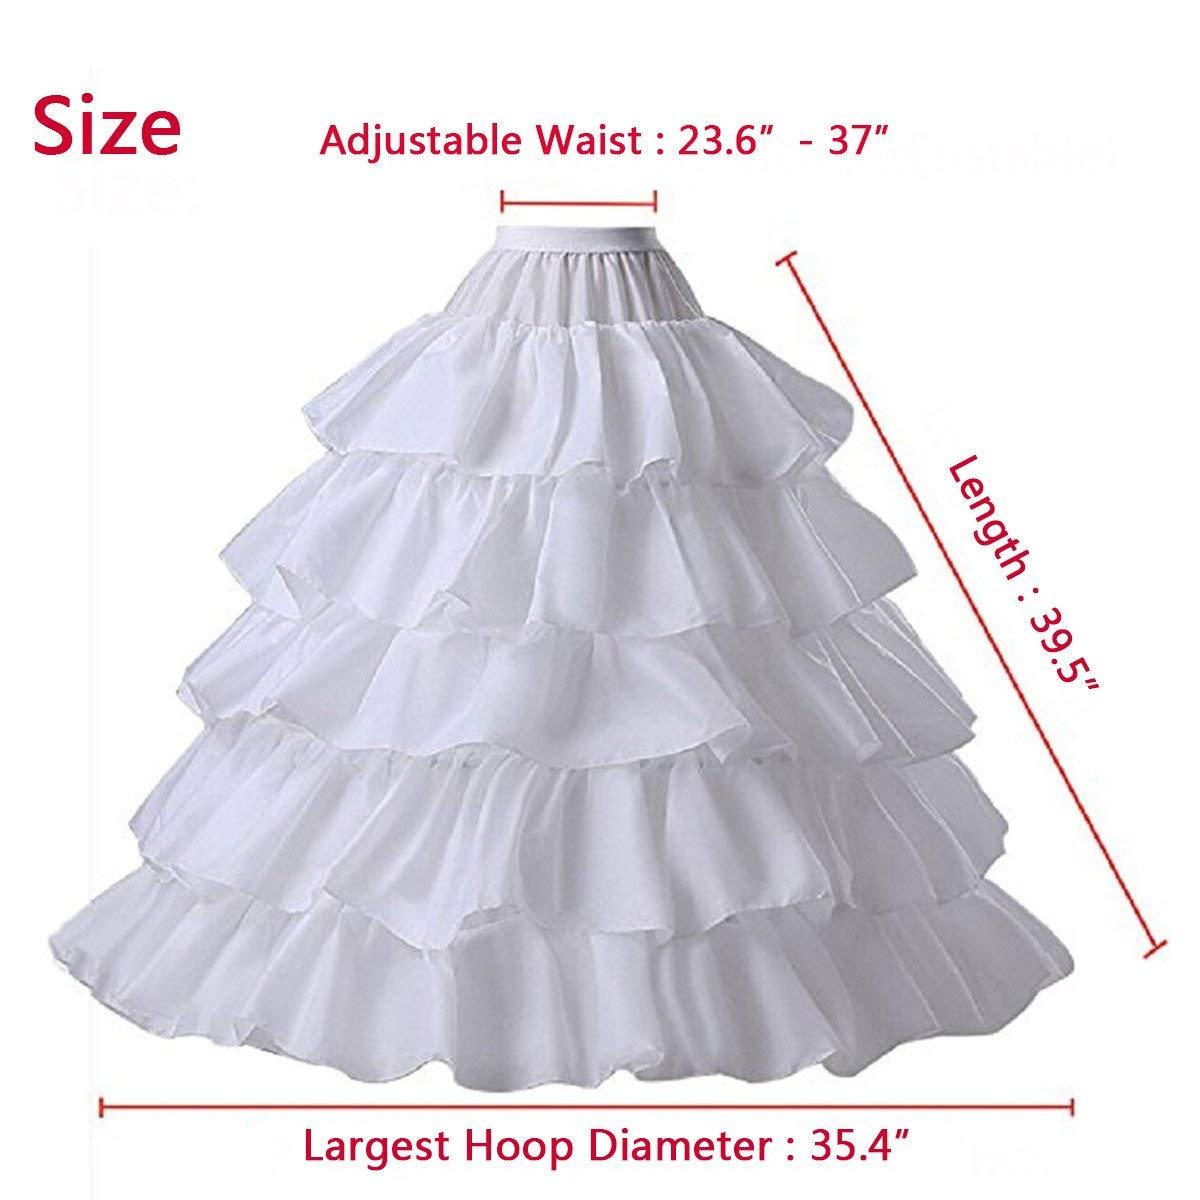 49d97d55465a BEAUTBRIDE Women 4-Hoop Wedding Petticoat Skirt Quinceanera Ball Gown Slip  White at Amazon Women's Clothing store: